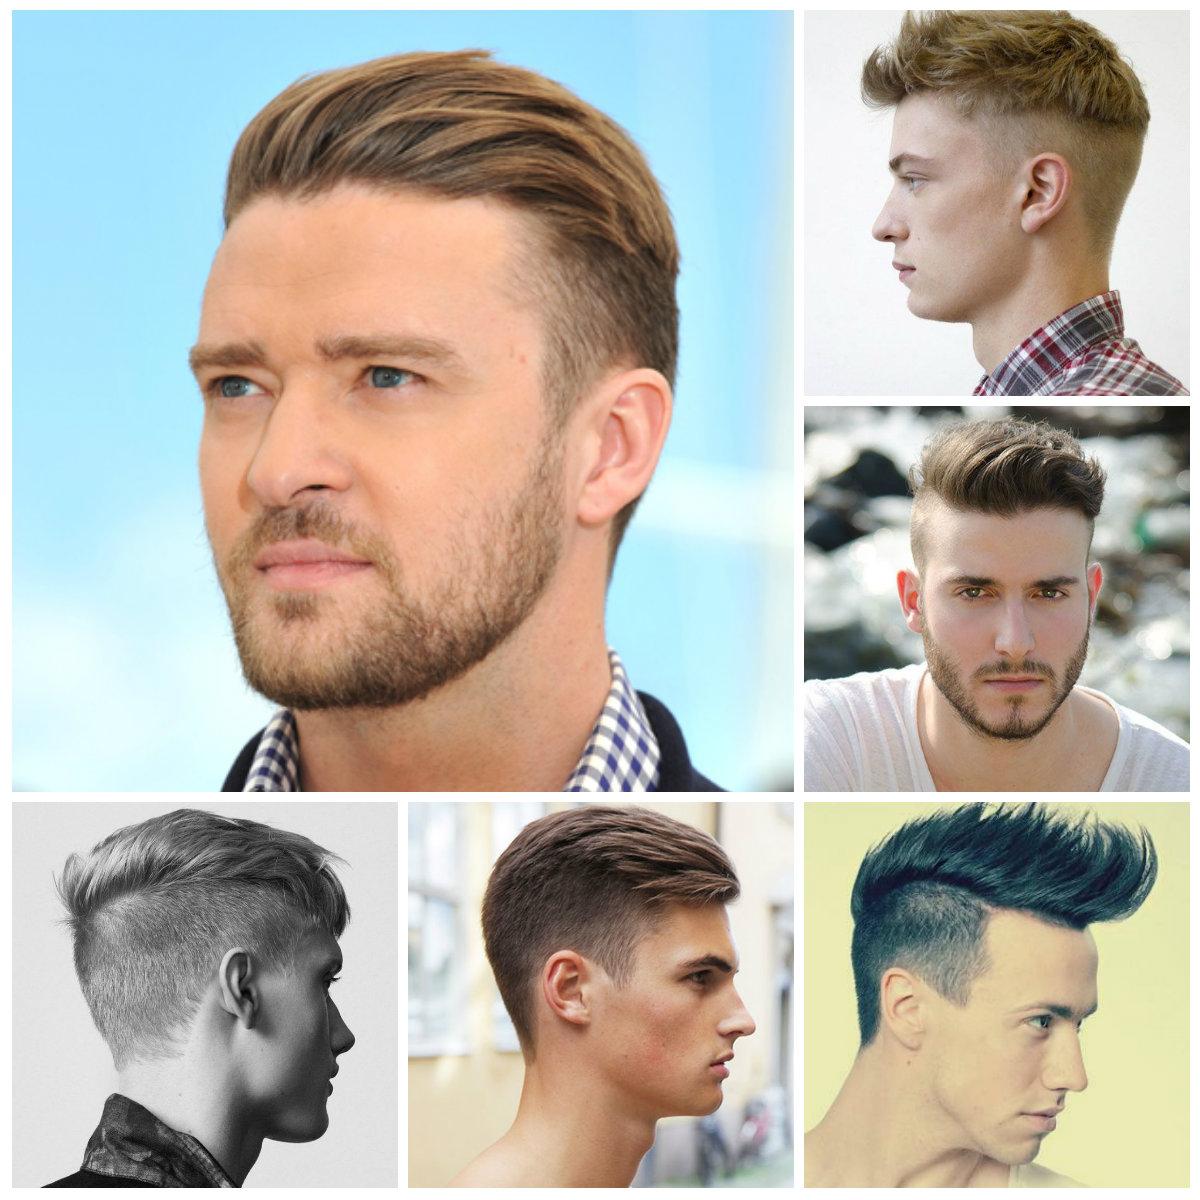 Latest Undercut Medium Hairstyles For Women With Regard To Men's Undercut Hairstyles For (View 12 of 20)